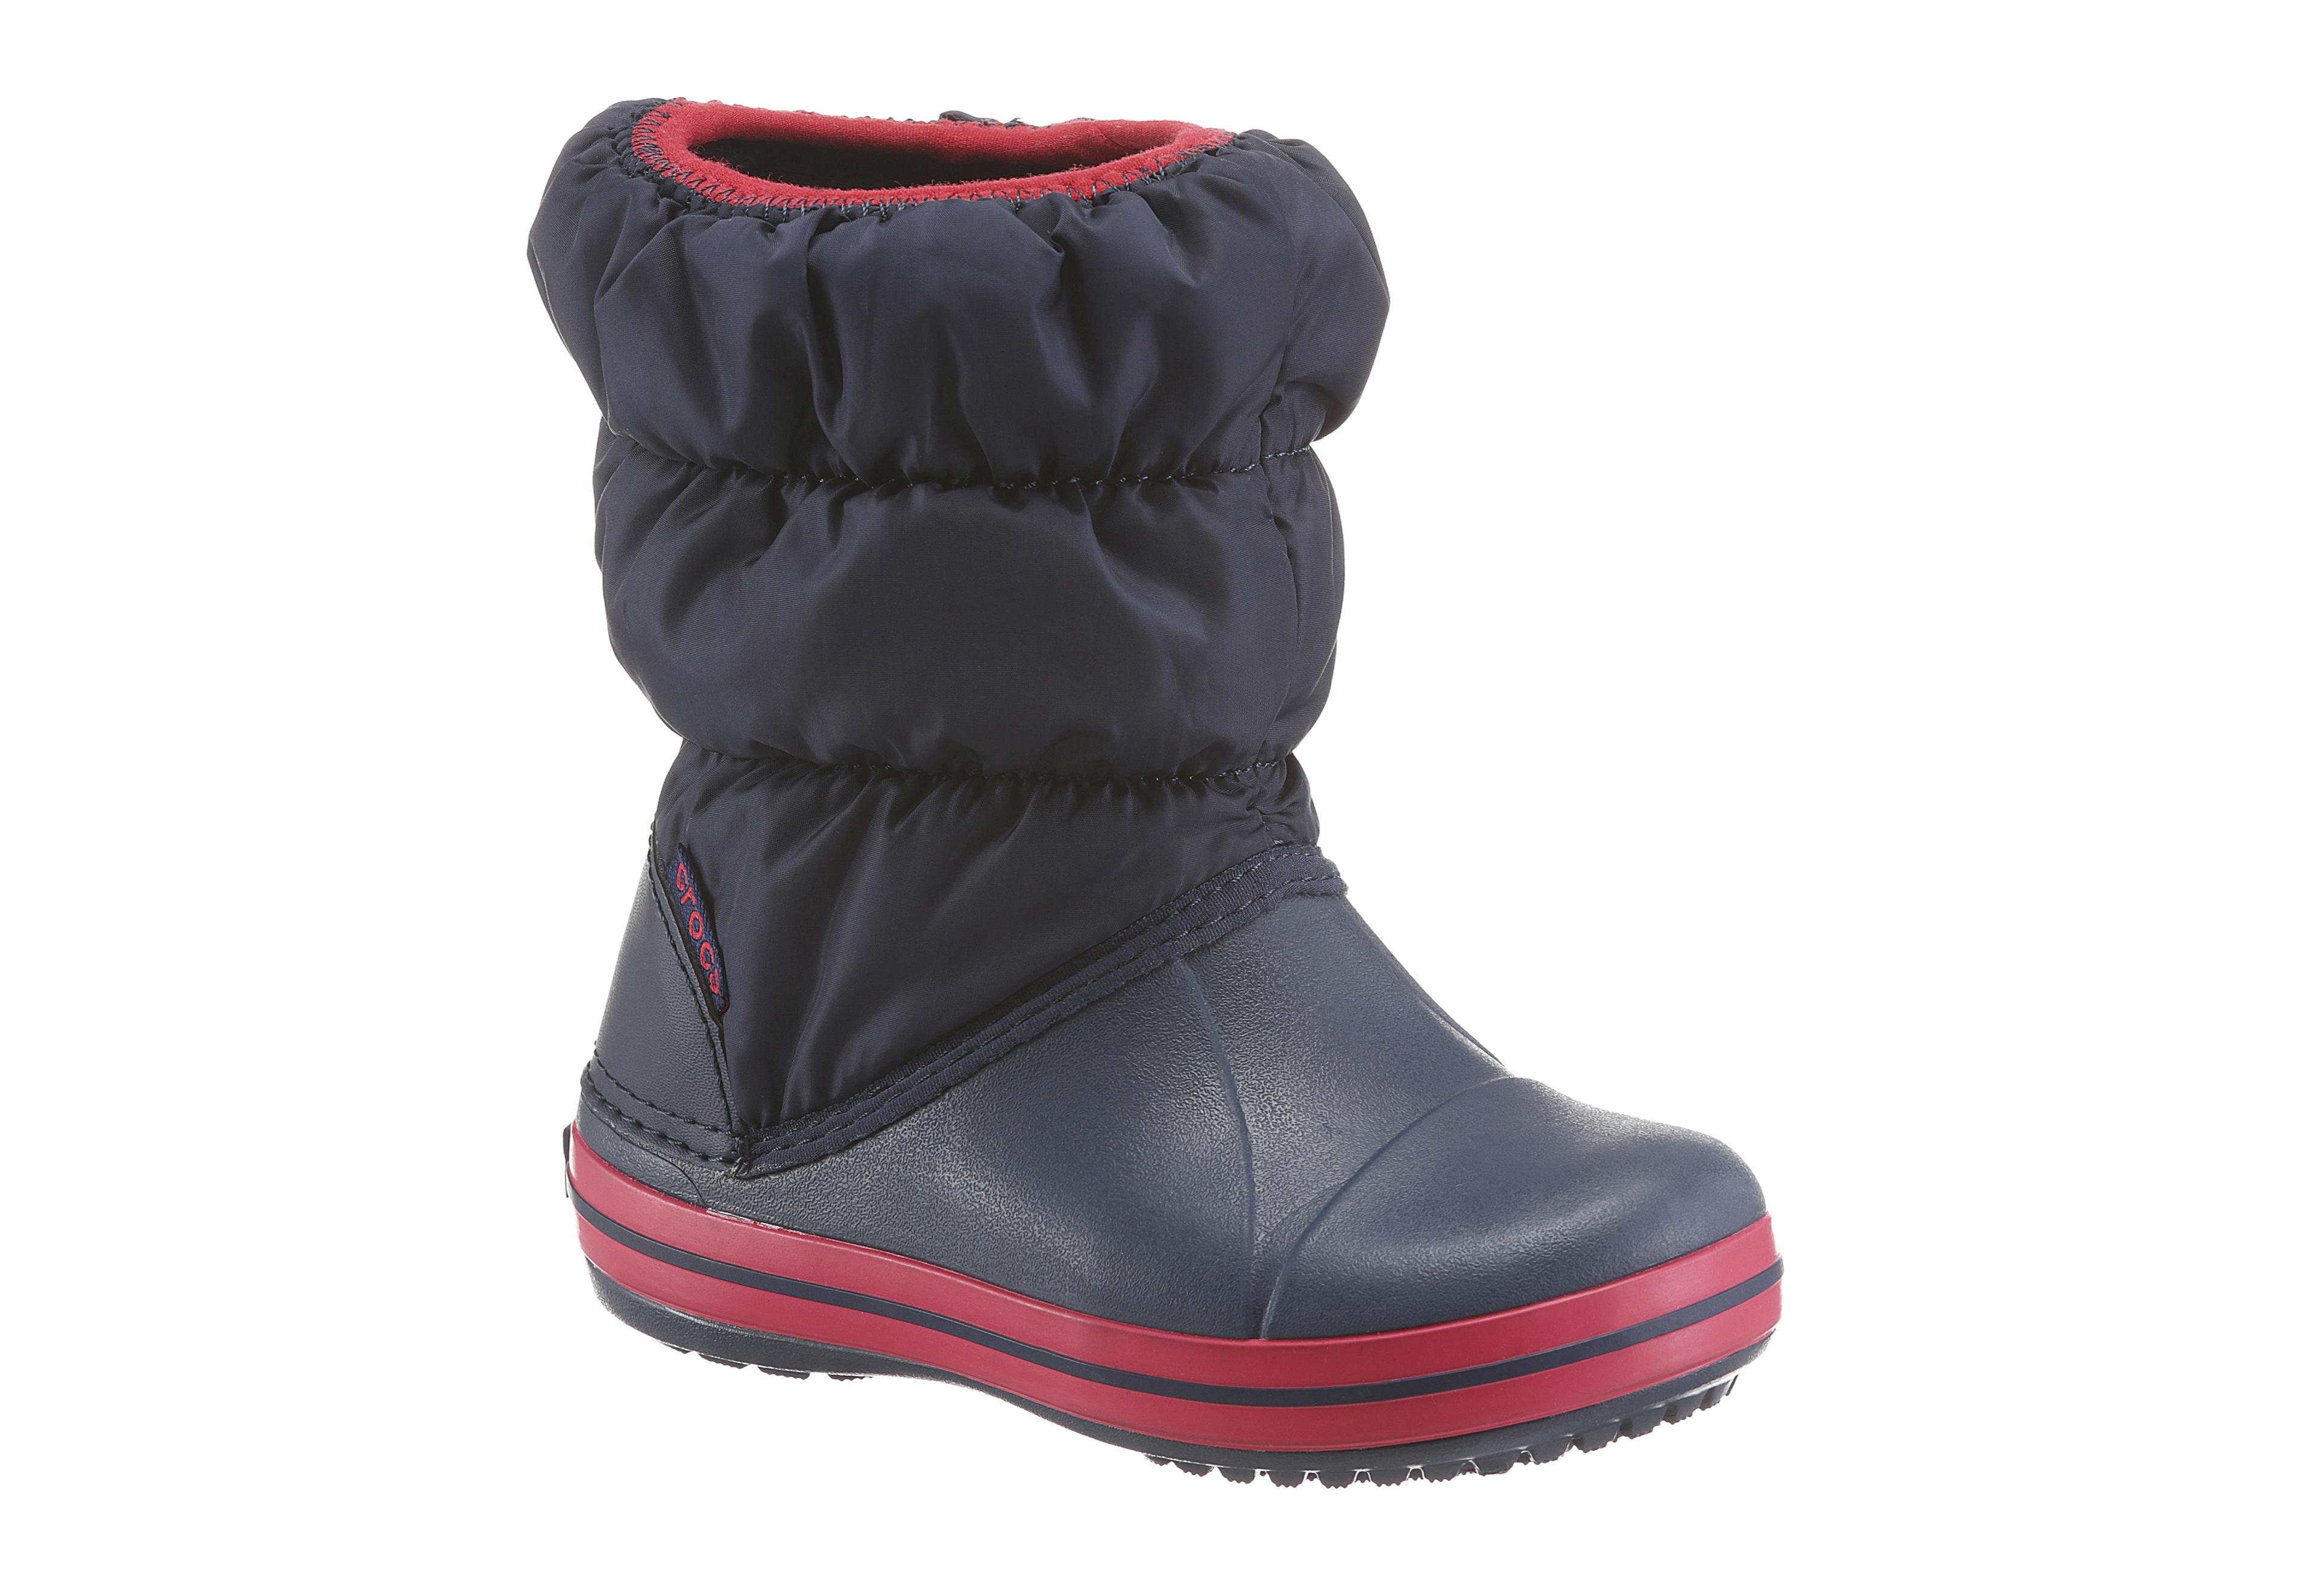 crocs -  Stiefel Winter Puff Boots Kids